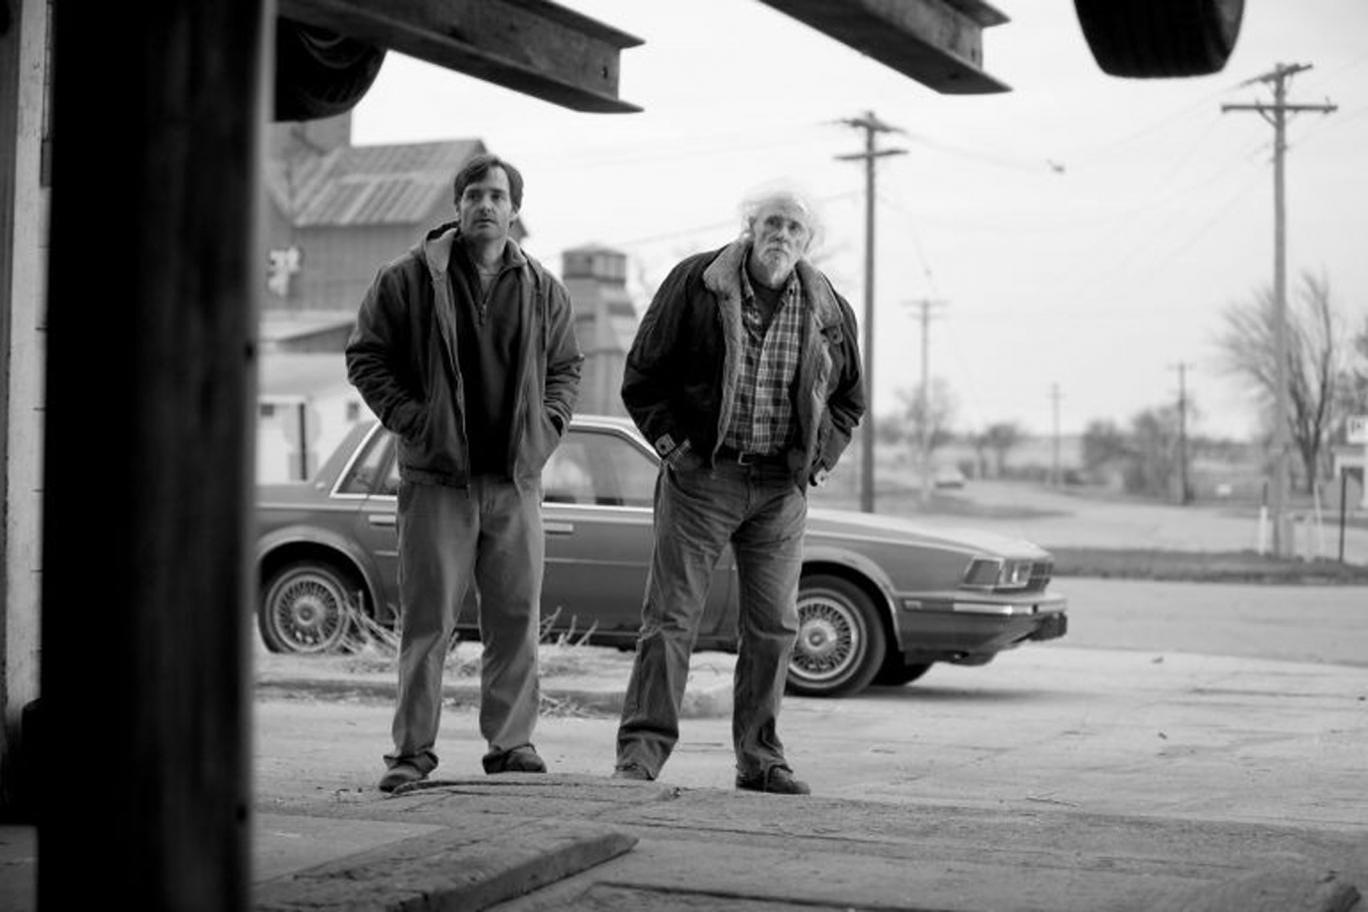 Taking the scenic route: Will Forte and Bruce Dern star in the drama 'Nebraska'